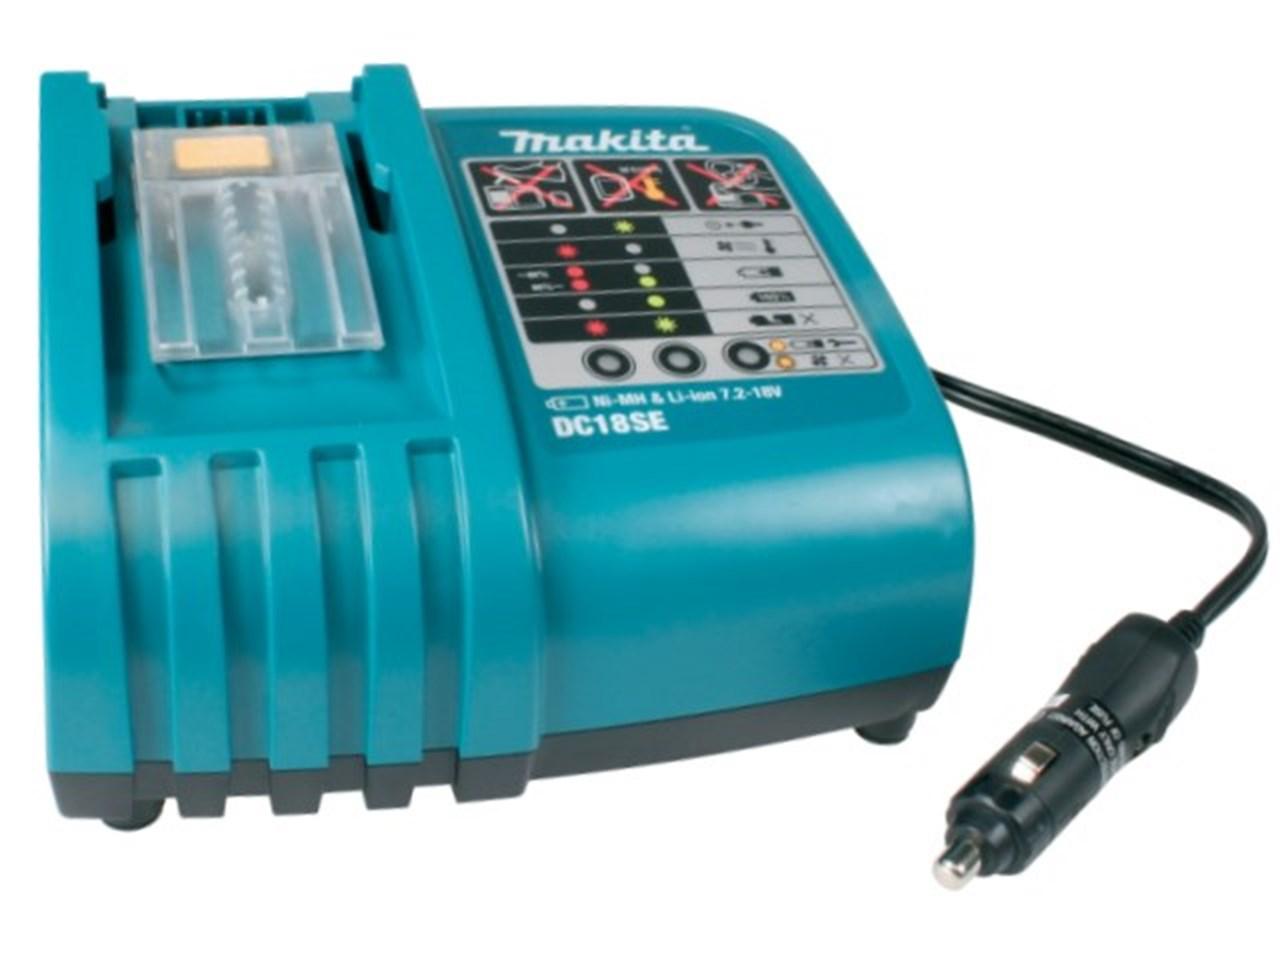 makita 18v battery charger instructions